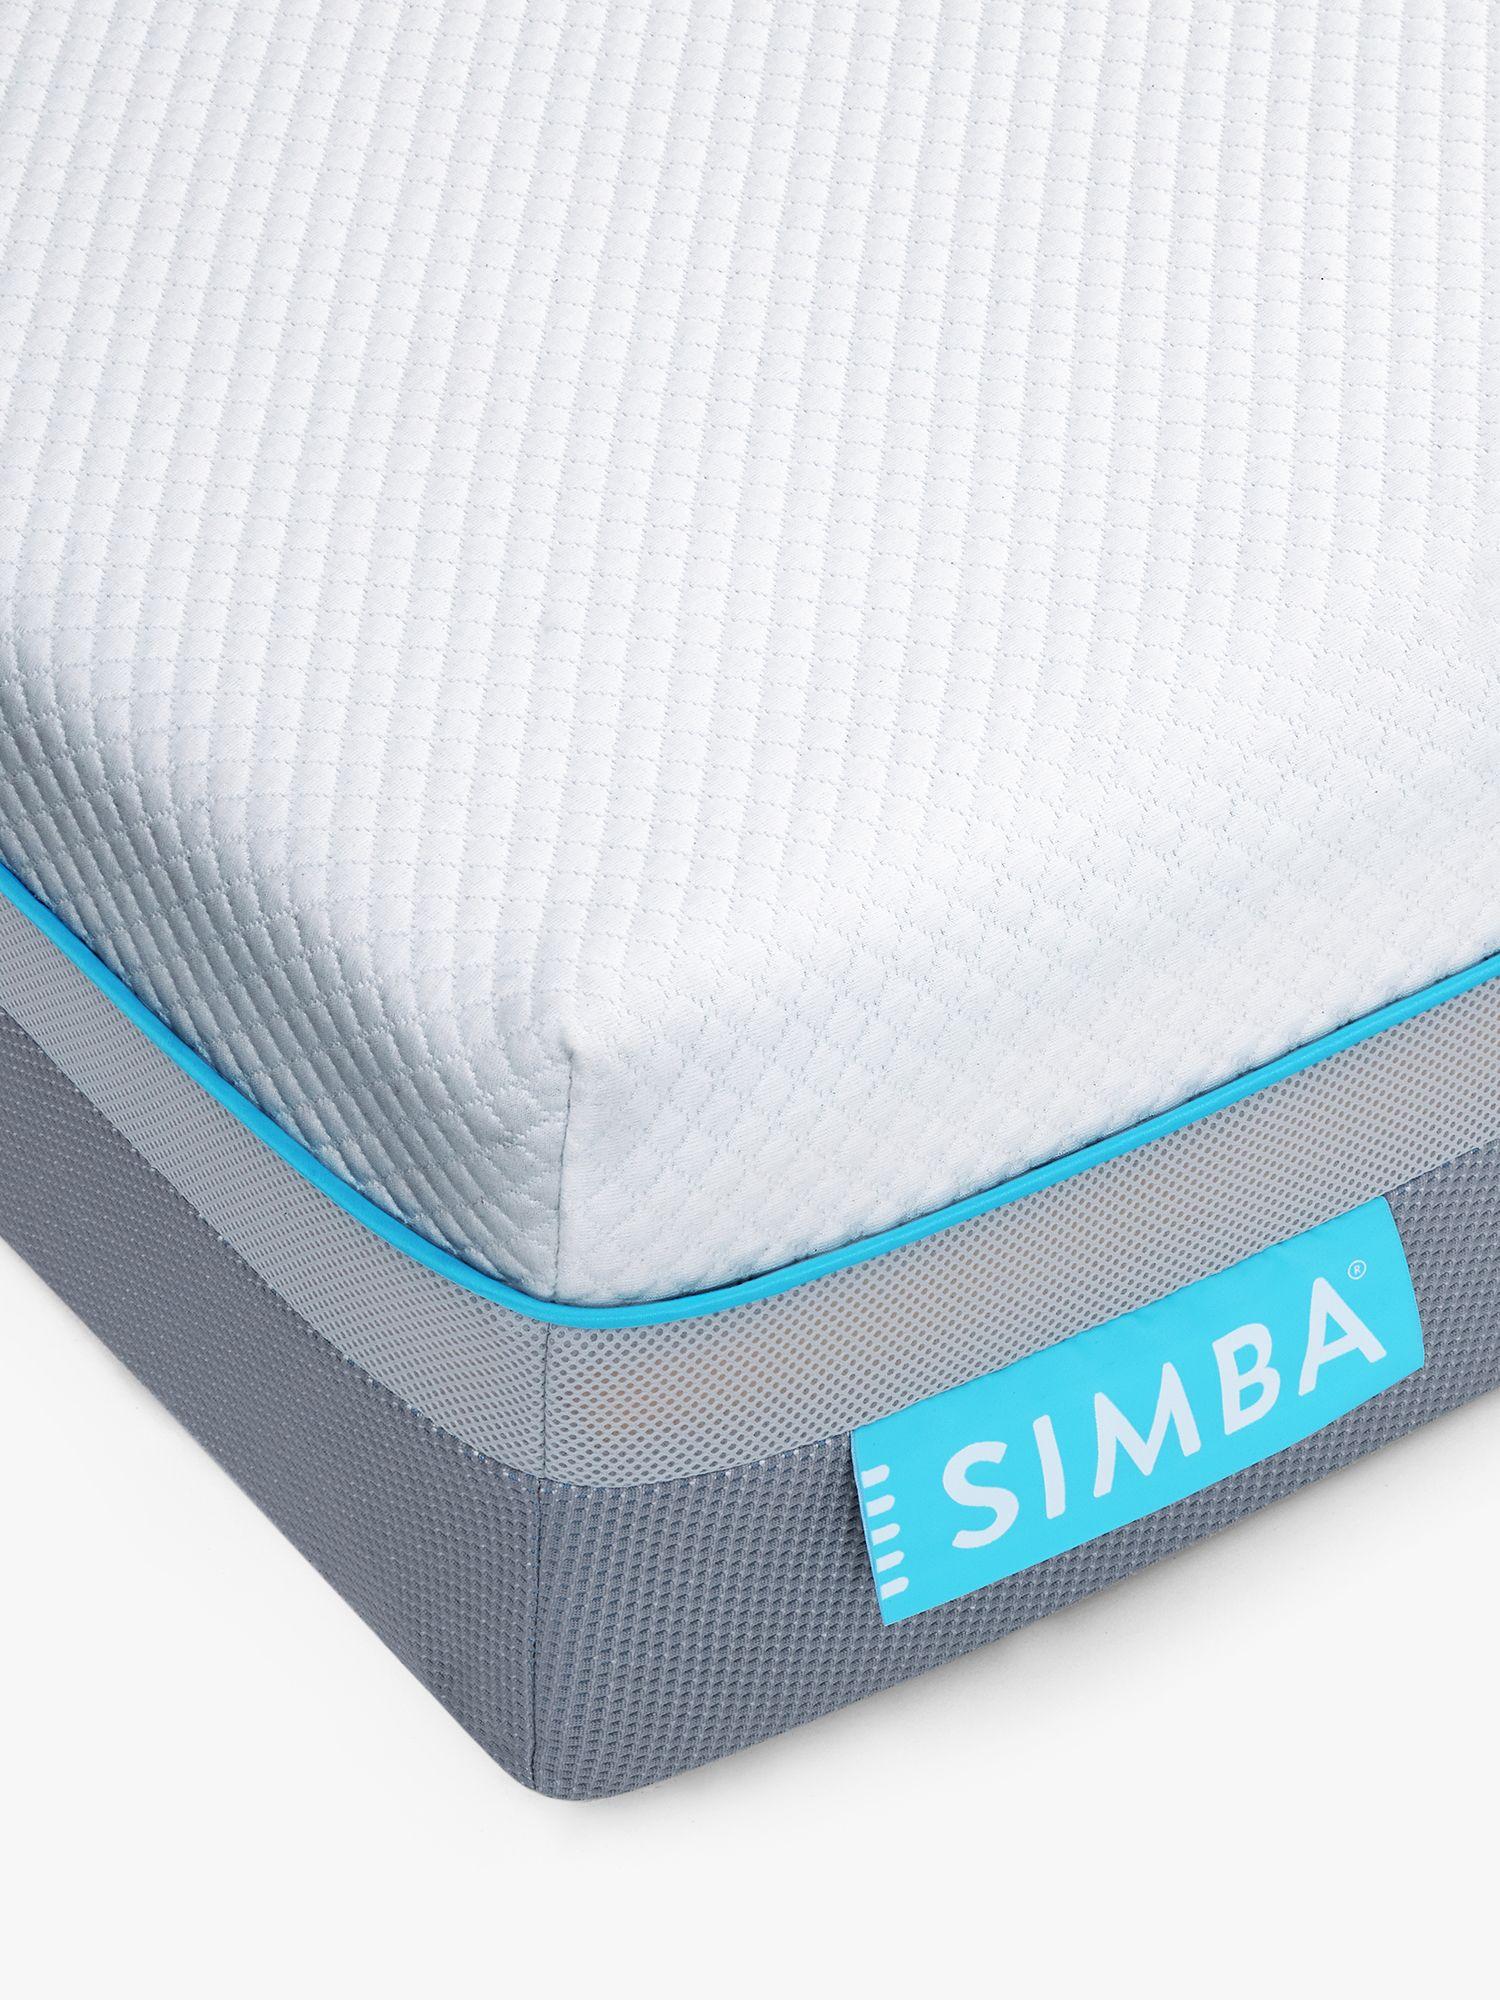 Simba Simba Hybrid® Air Cool Pocket Spring Memory Foam Mattress, Medium Tension, Small Double